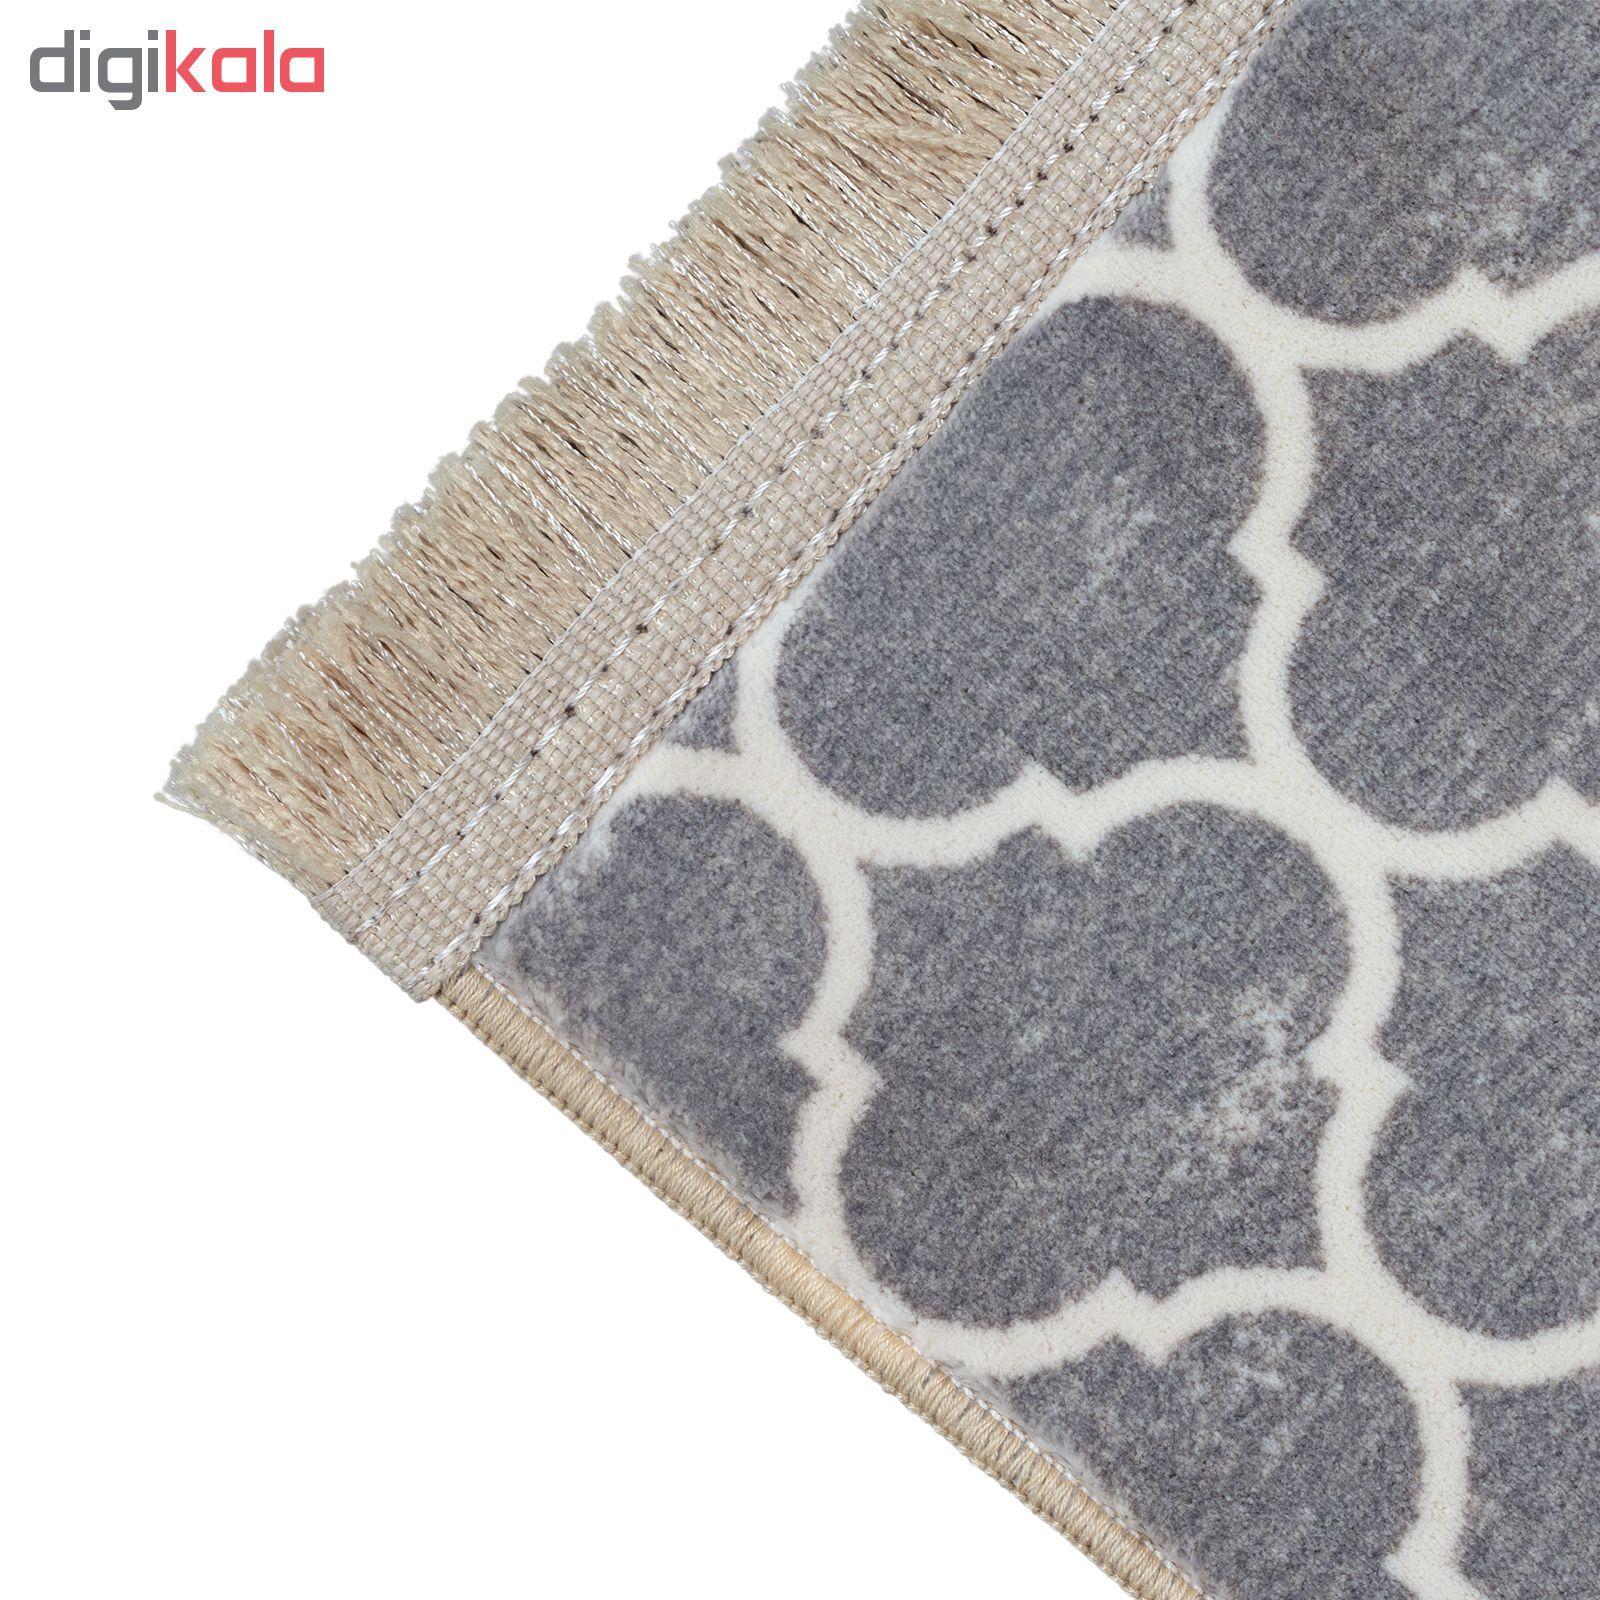 فرش ماشینی محتشم کد 100450 زمینه طوسی main 1 3